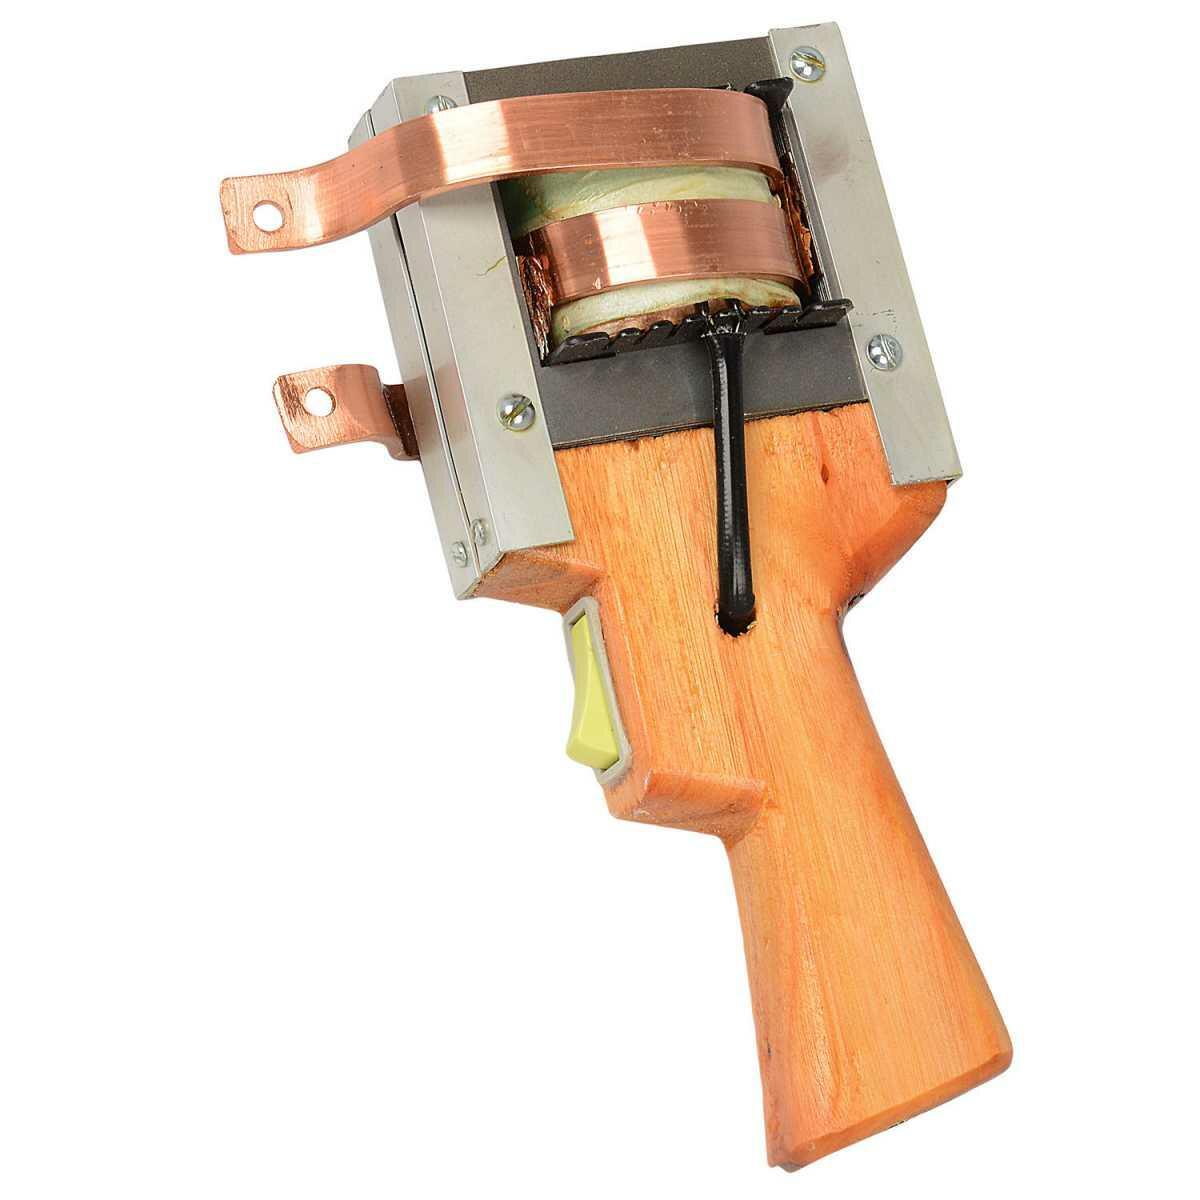 Ferro de Solda Tipo Pistola de Madeira 750W Bumafer